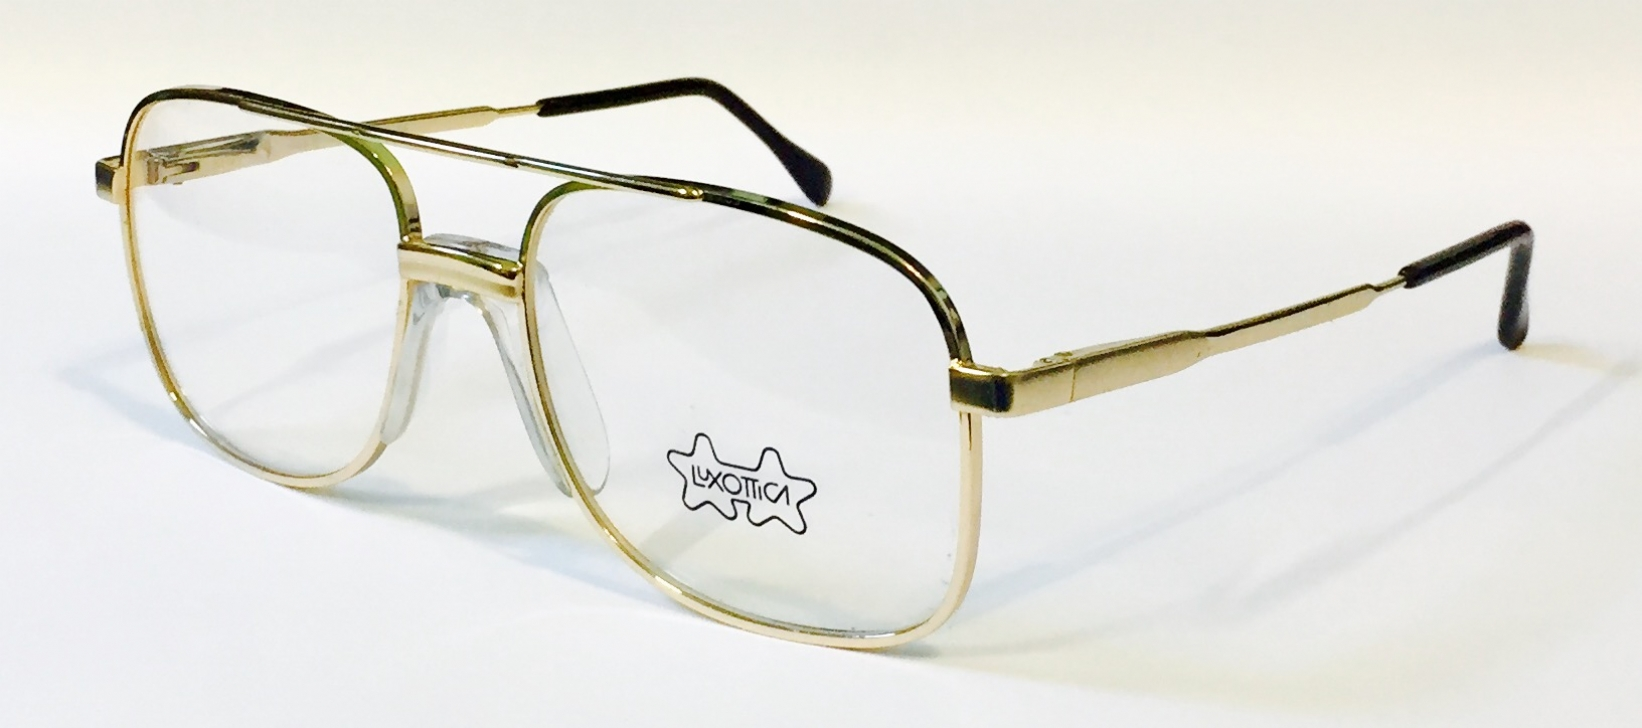 buy luxottica titanium eyeglasses directly from opticsfast